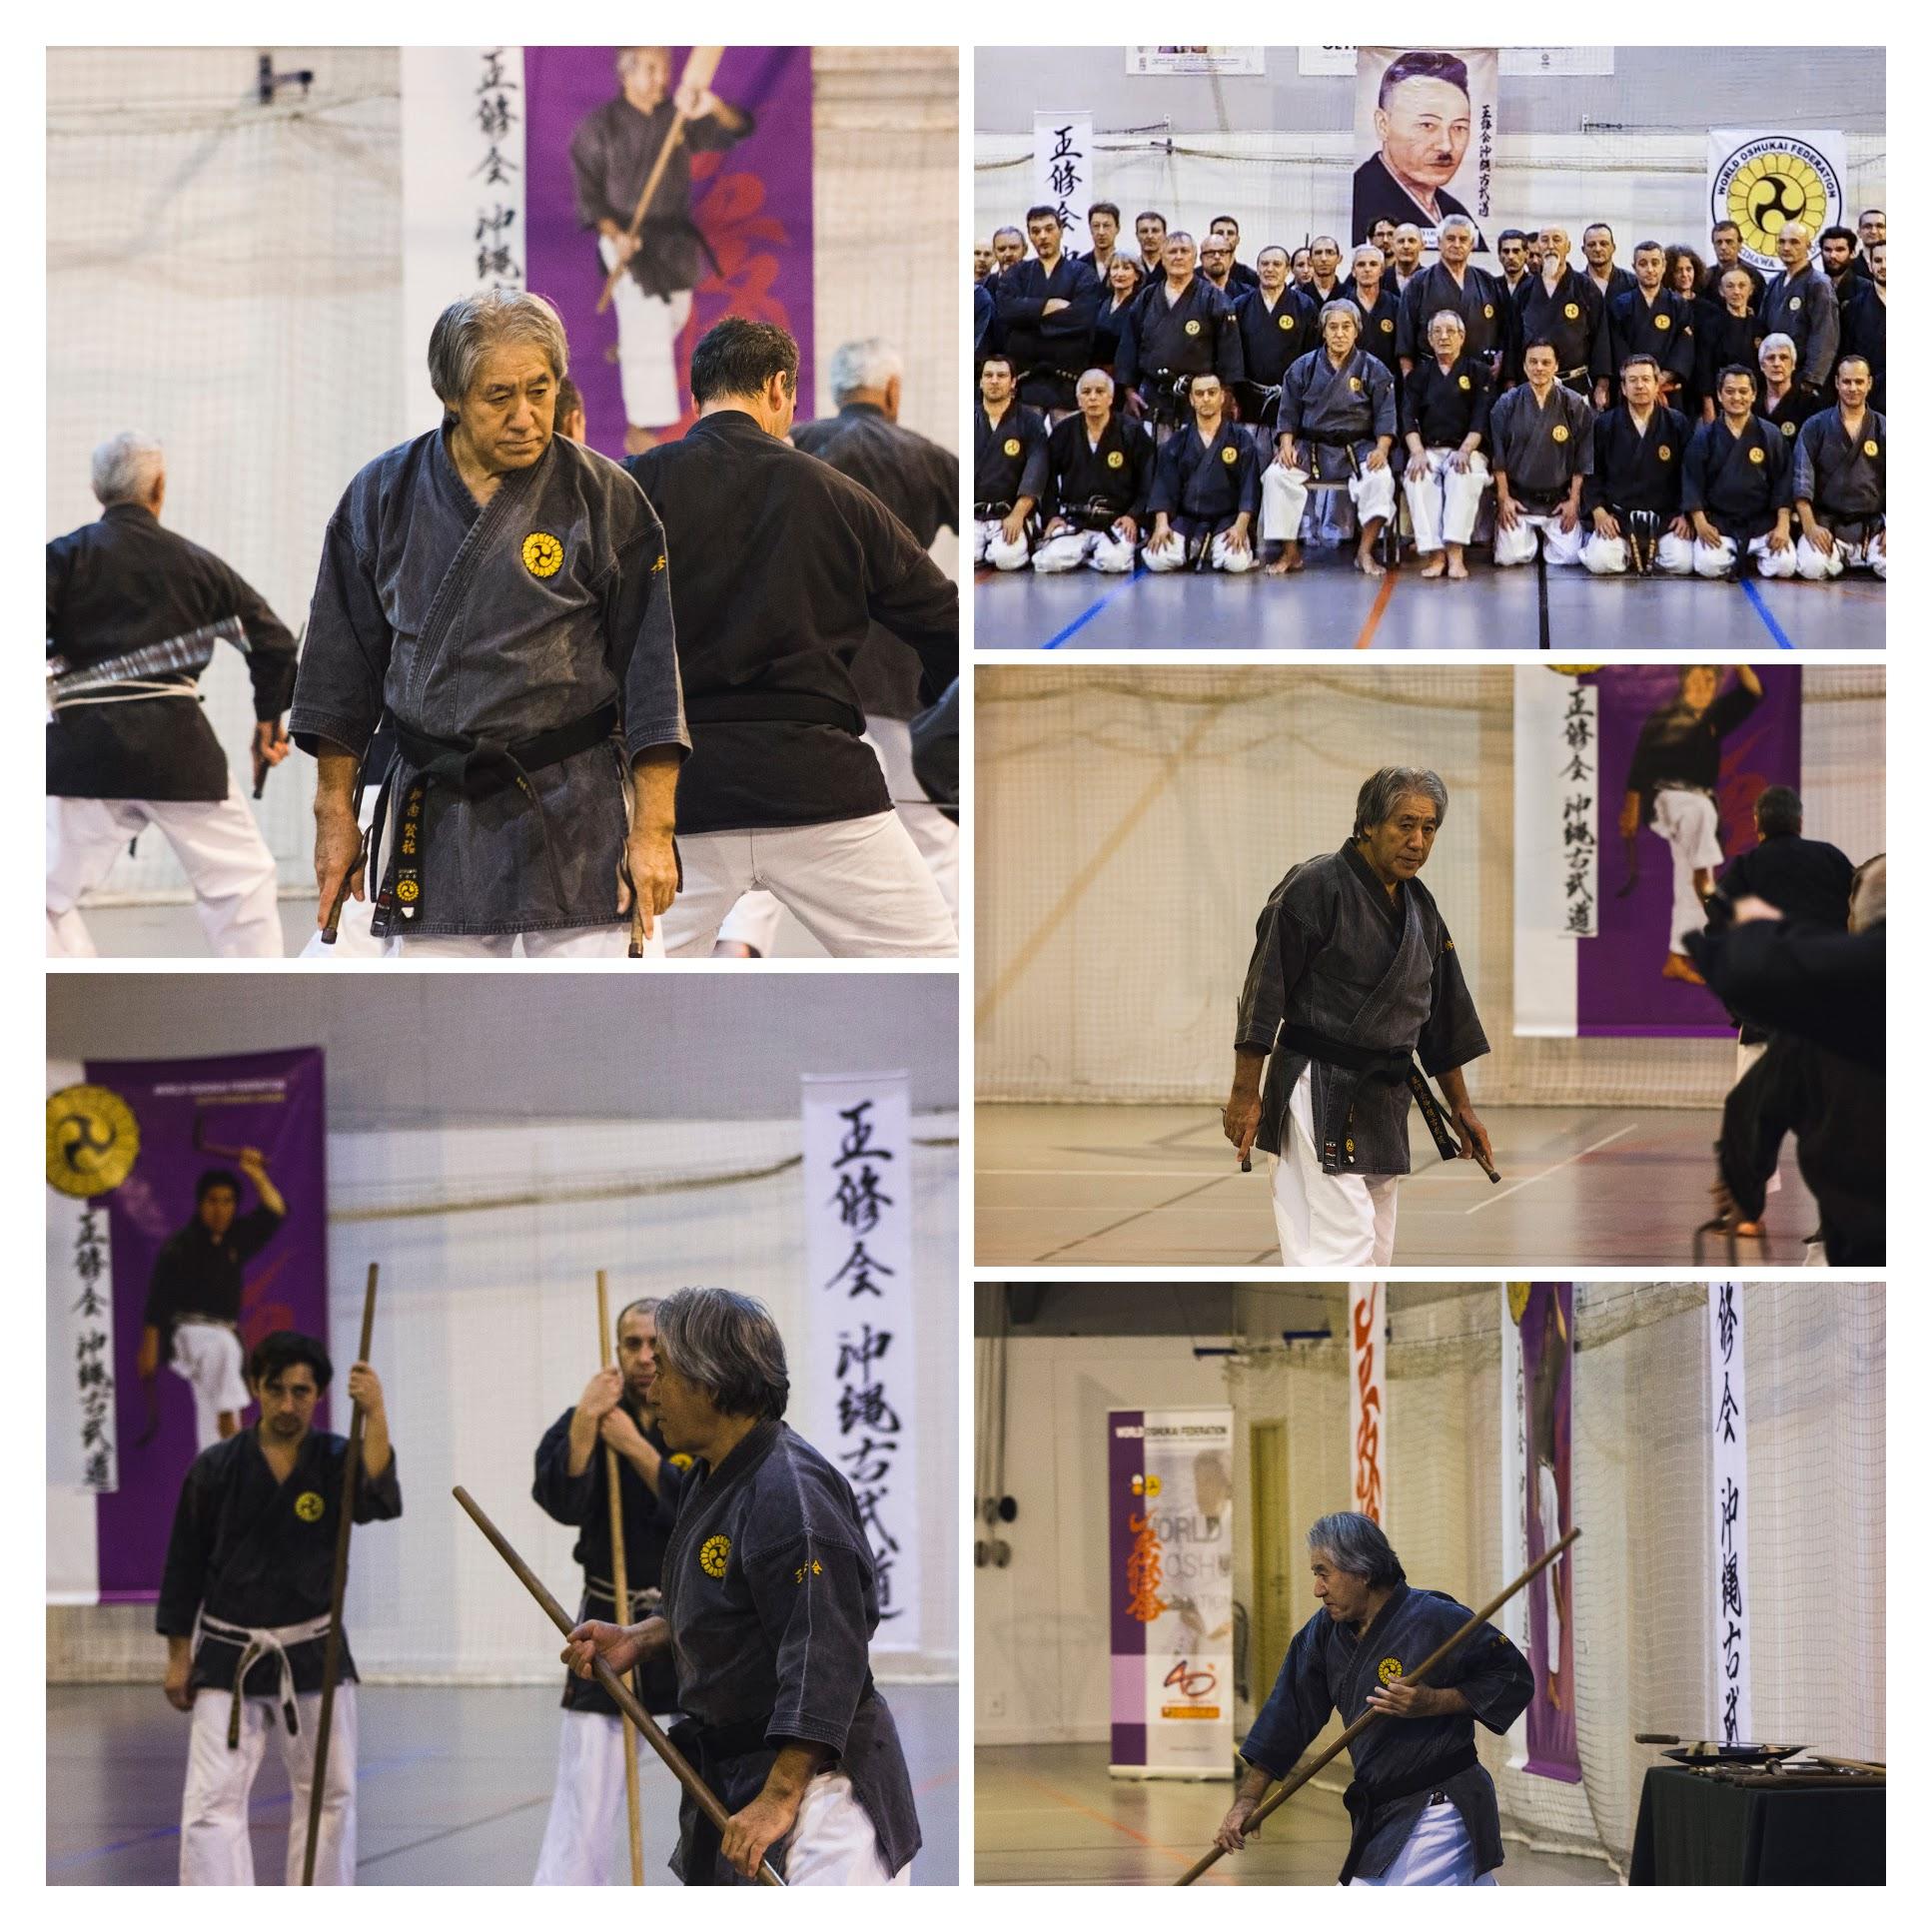 Stage International Oshukai de Kobudo d'Okinawa dirigé par Sensei CHINEN 9è Dan Hanshi